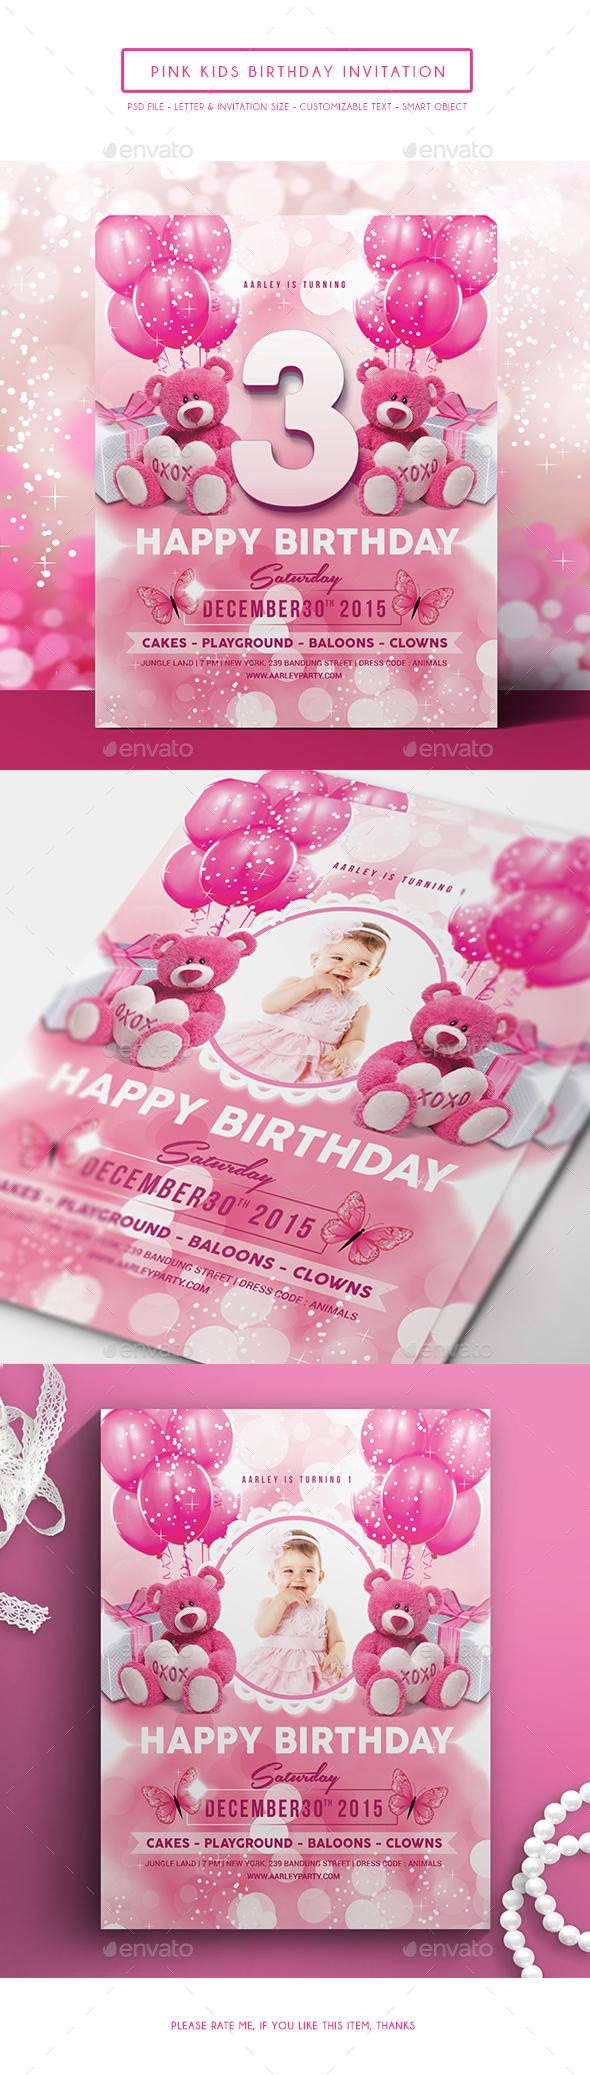 Pink Kids Birthday Invitation - Birthday Greeting Cards